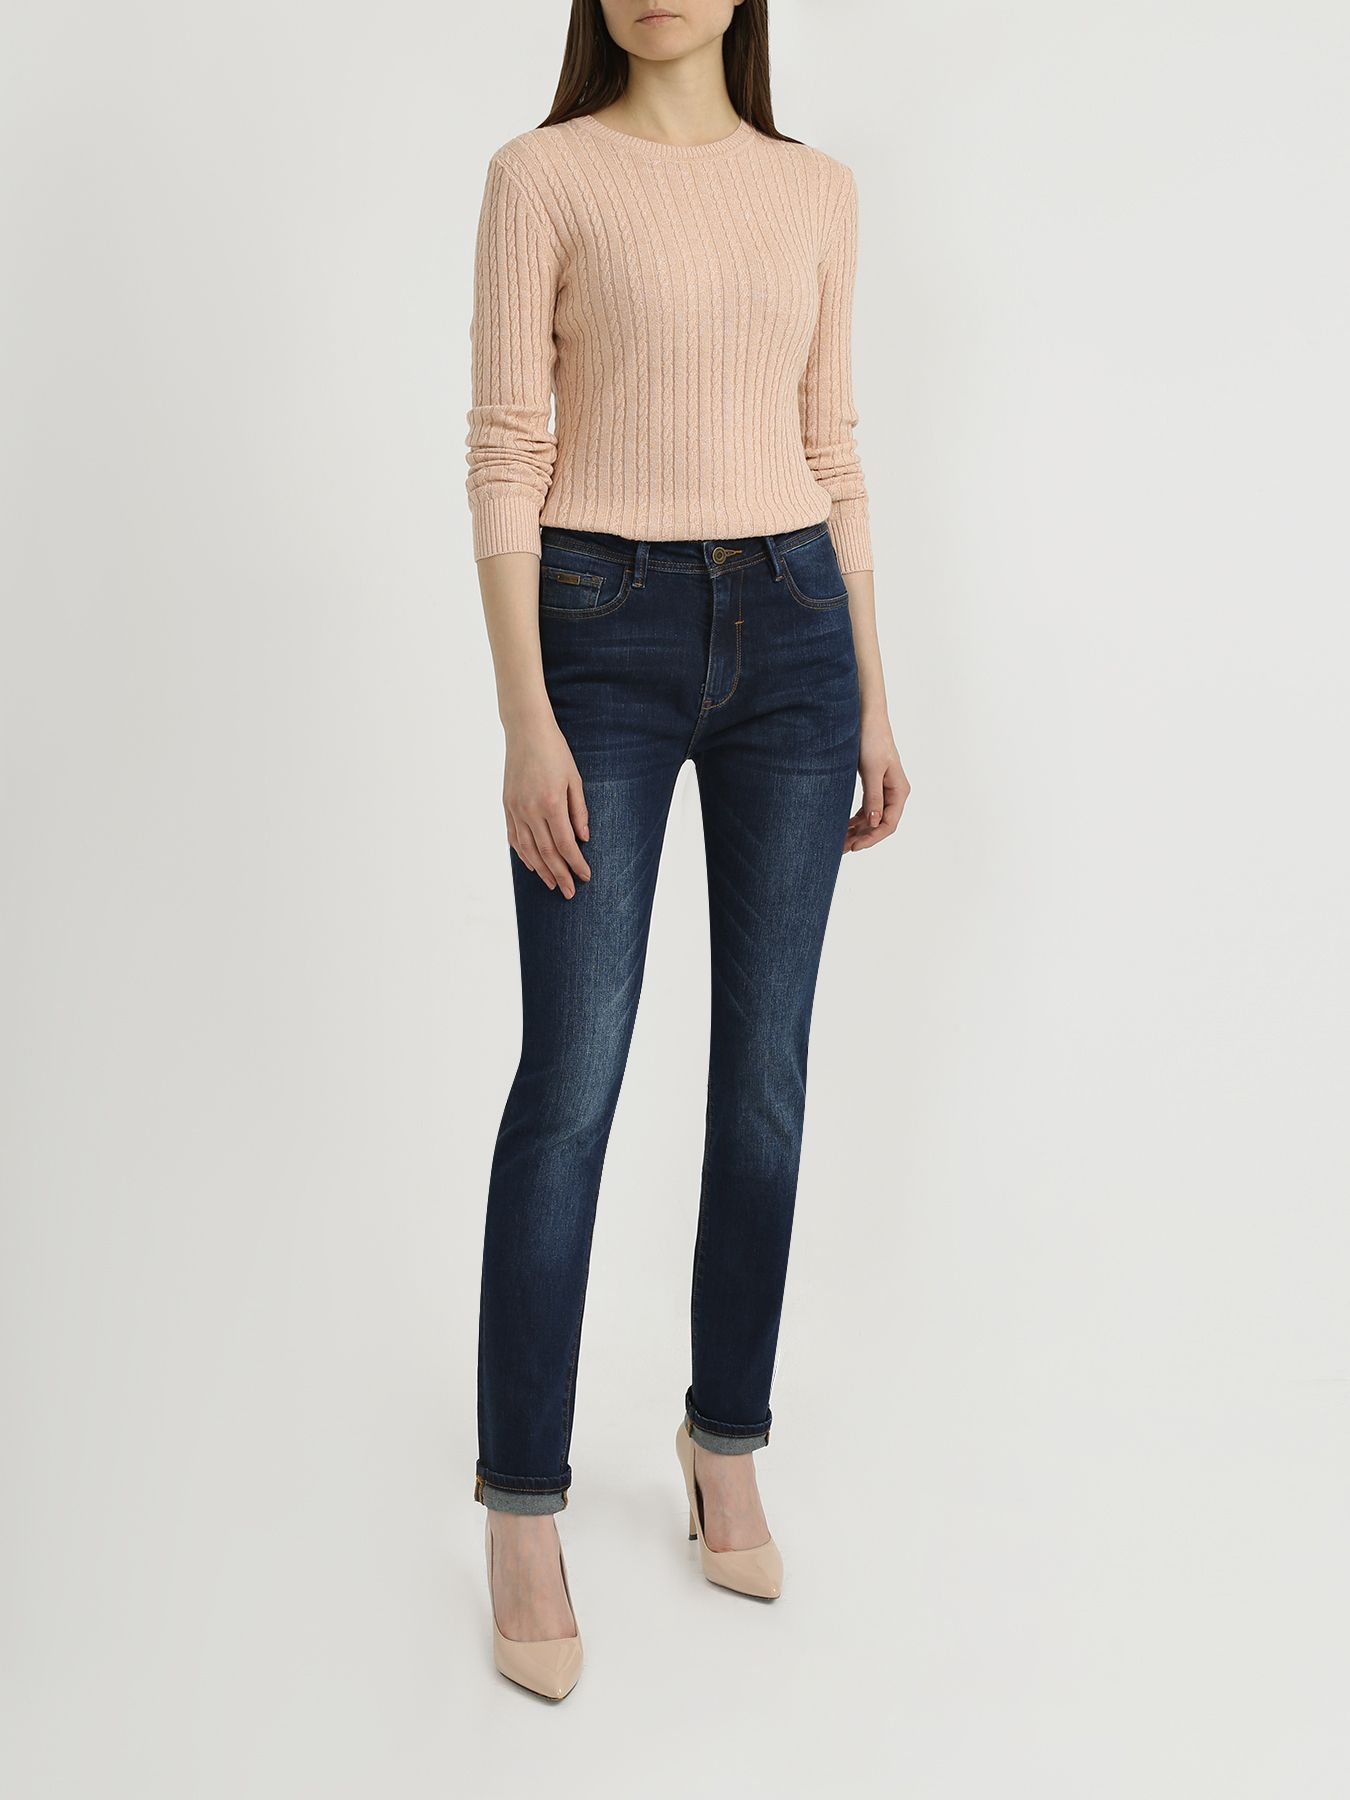 Брюки ORSA Orange Женские джинсы брюки orsa orange женские джинсы